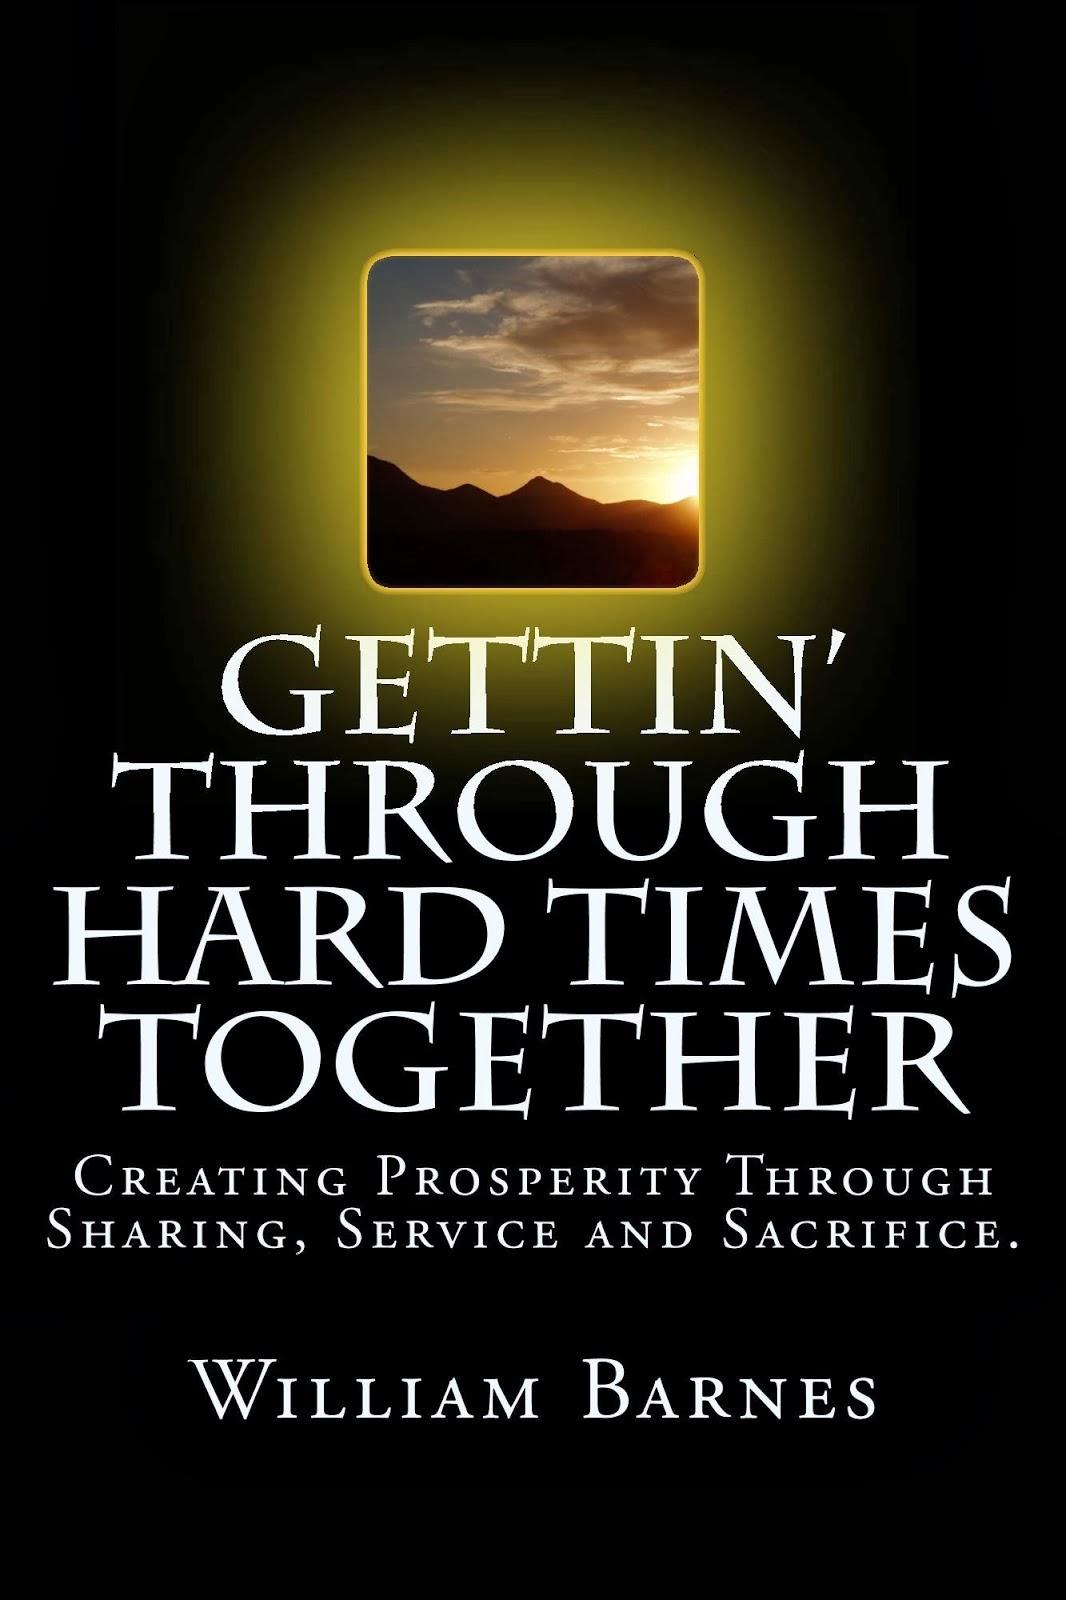 Gettin' Through Hard Times Together